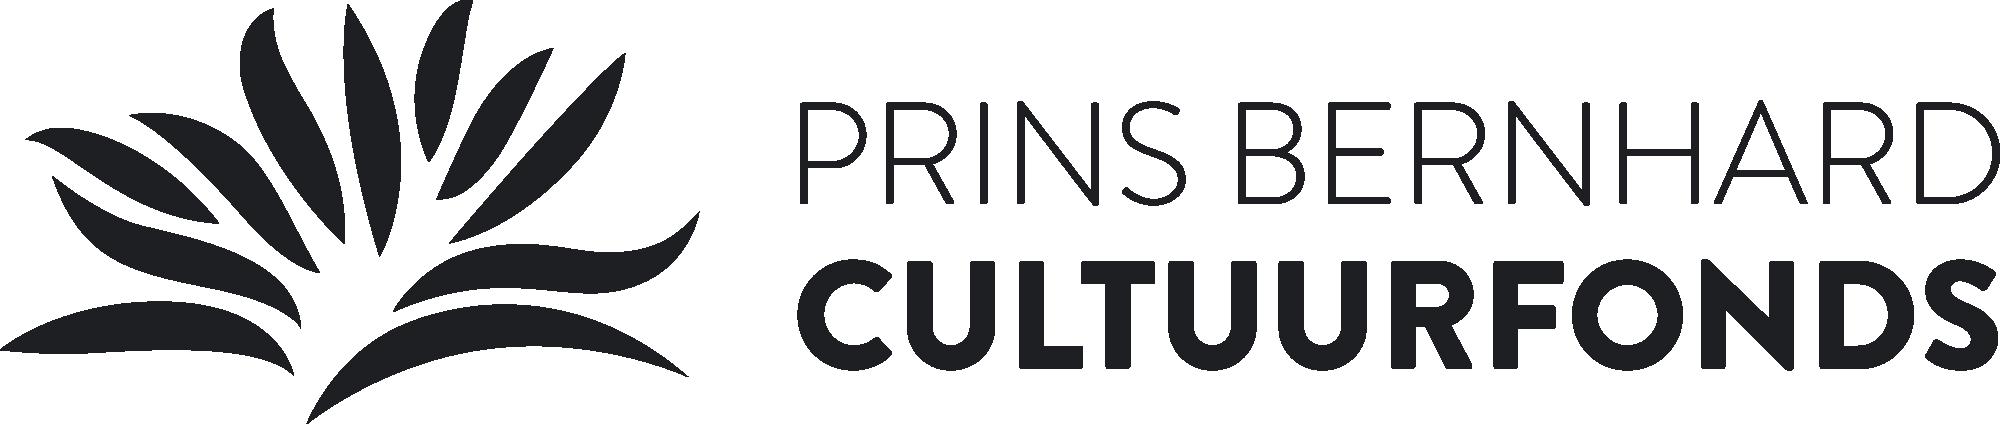 Prins Bernhard Cultuurfonds - horizontaa